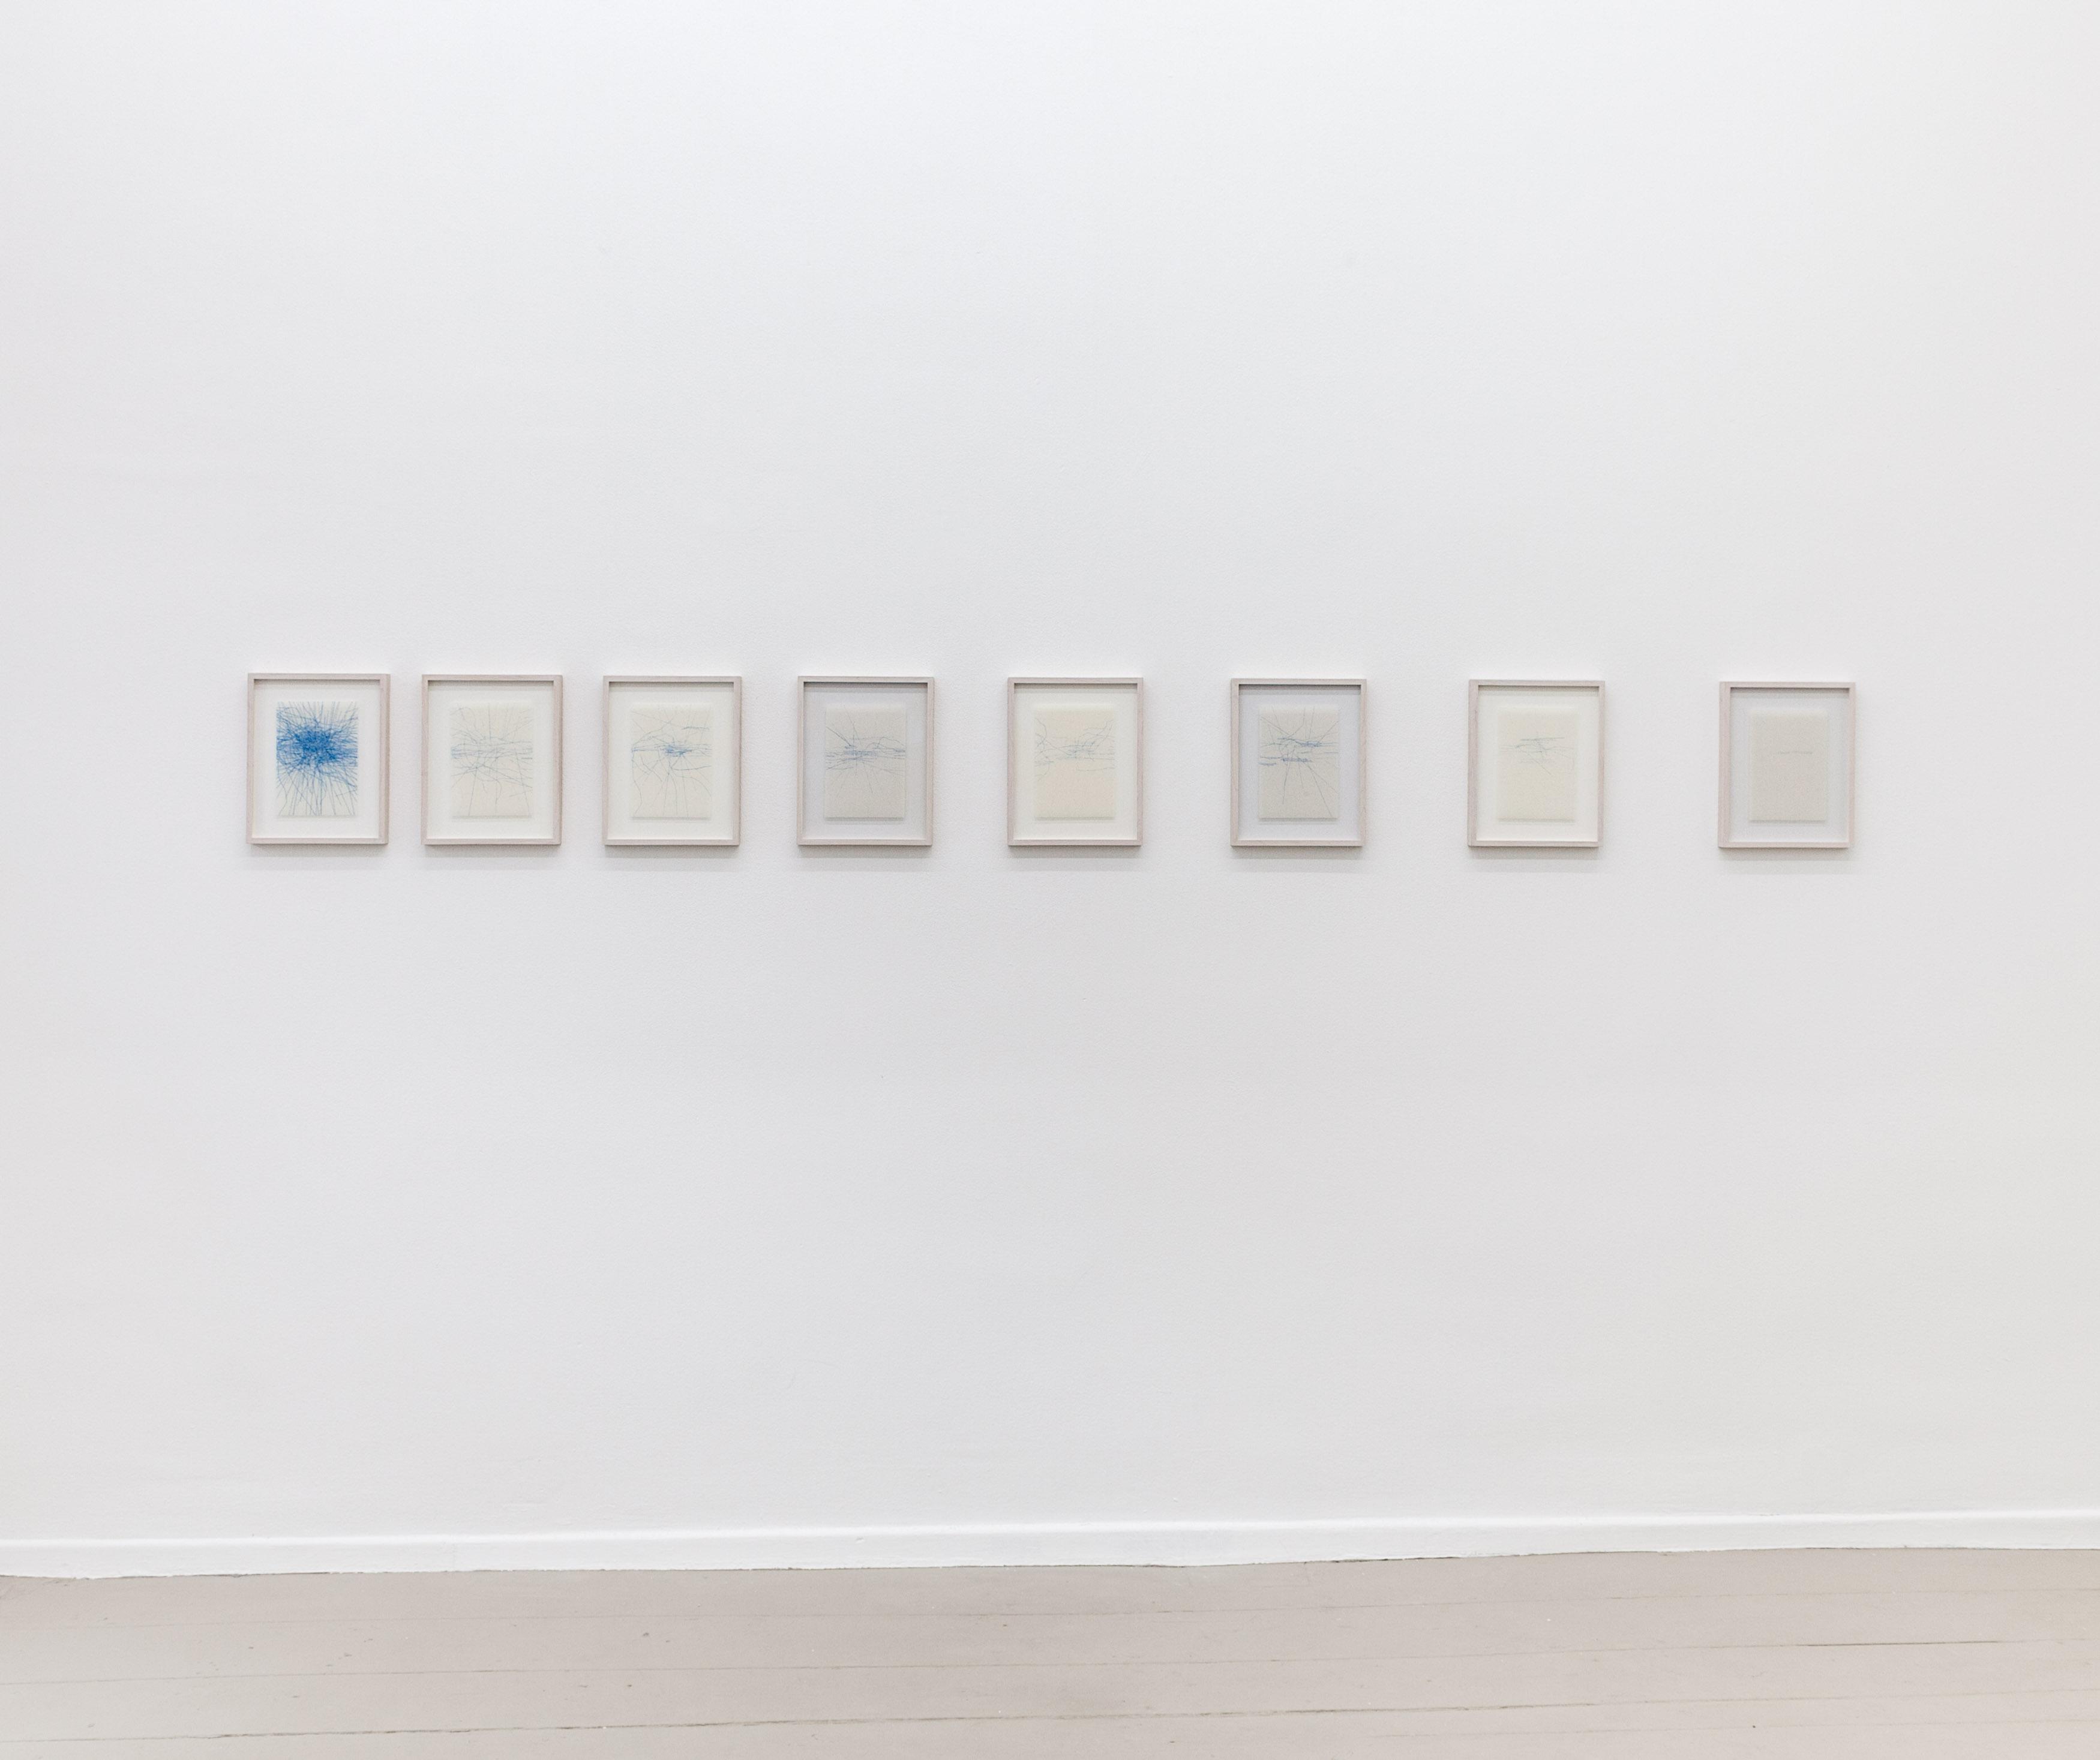 Paula Doepfner - Oh me, oh my, I´m sittin´ and thinkin´ of the days gone by (I-VIII), 2013